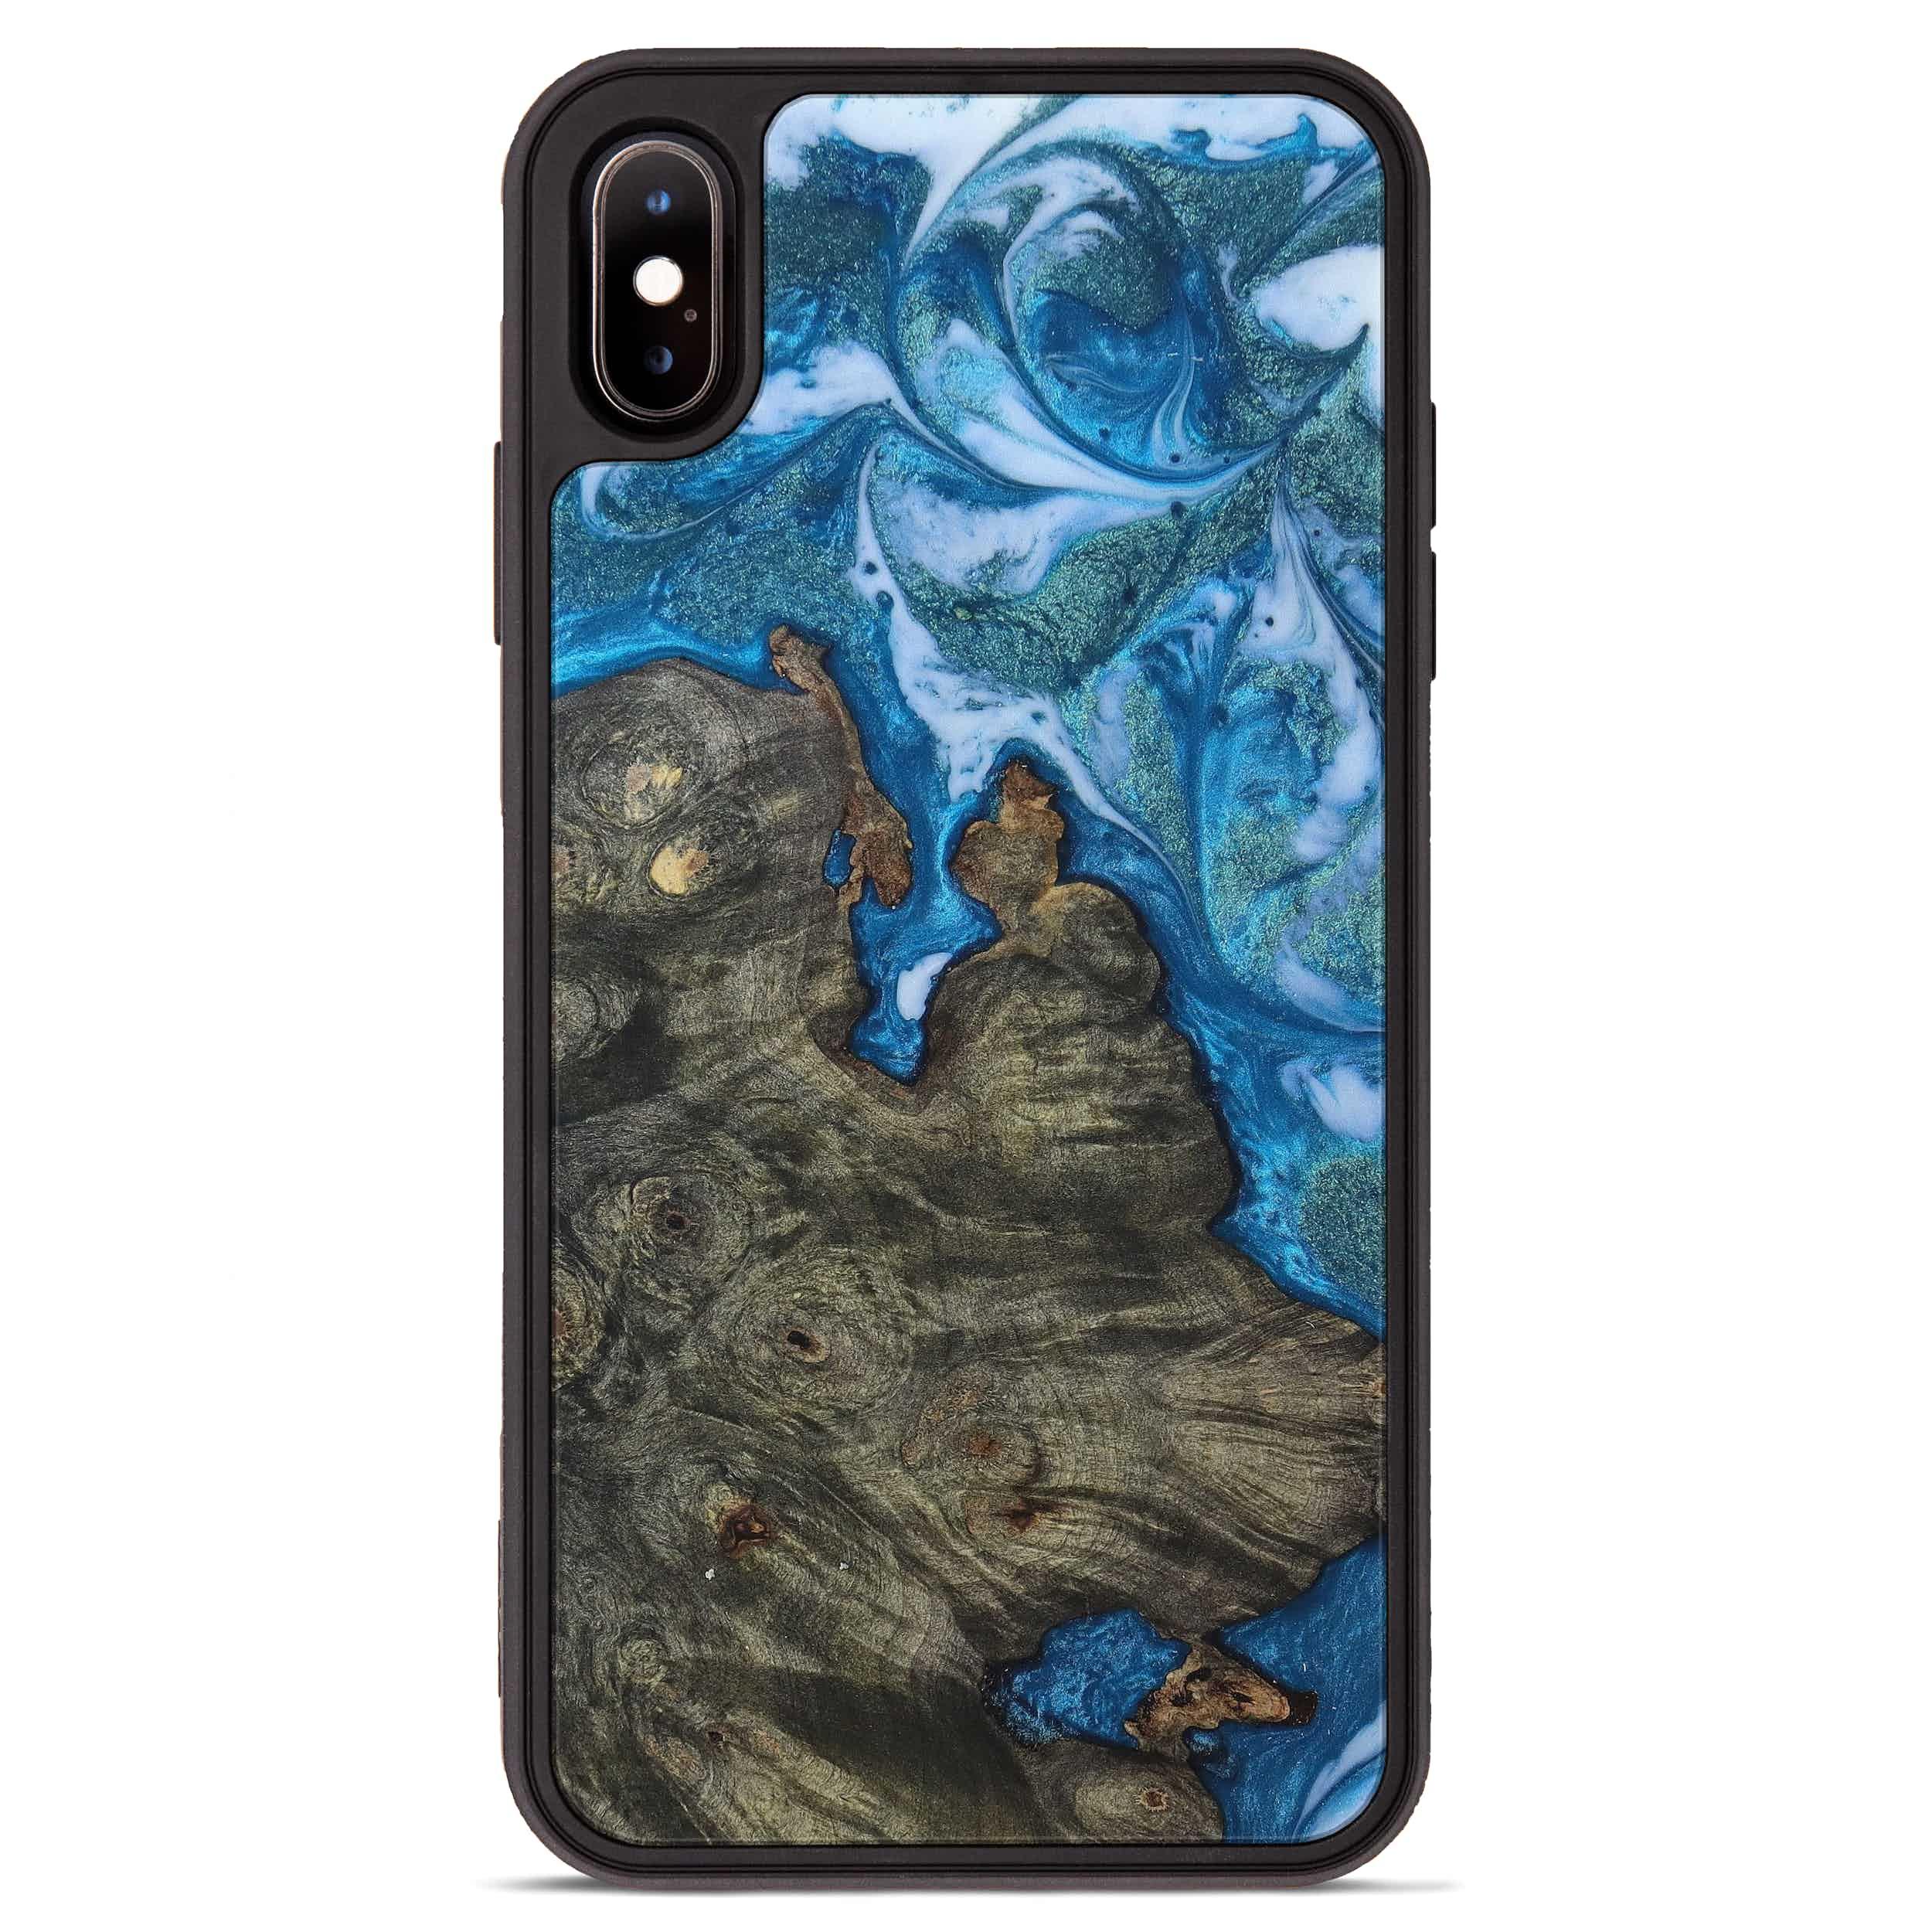 iPhone Xs Max Wood+Resin Phone Case - Hoekstra (Light Blue, 394824)